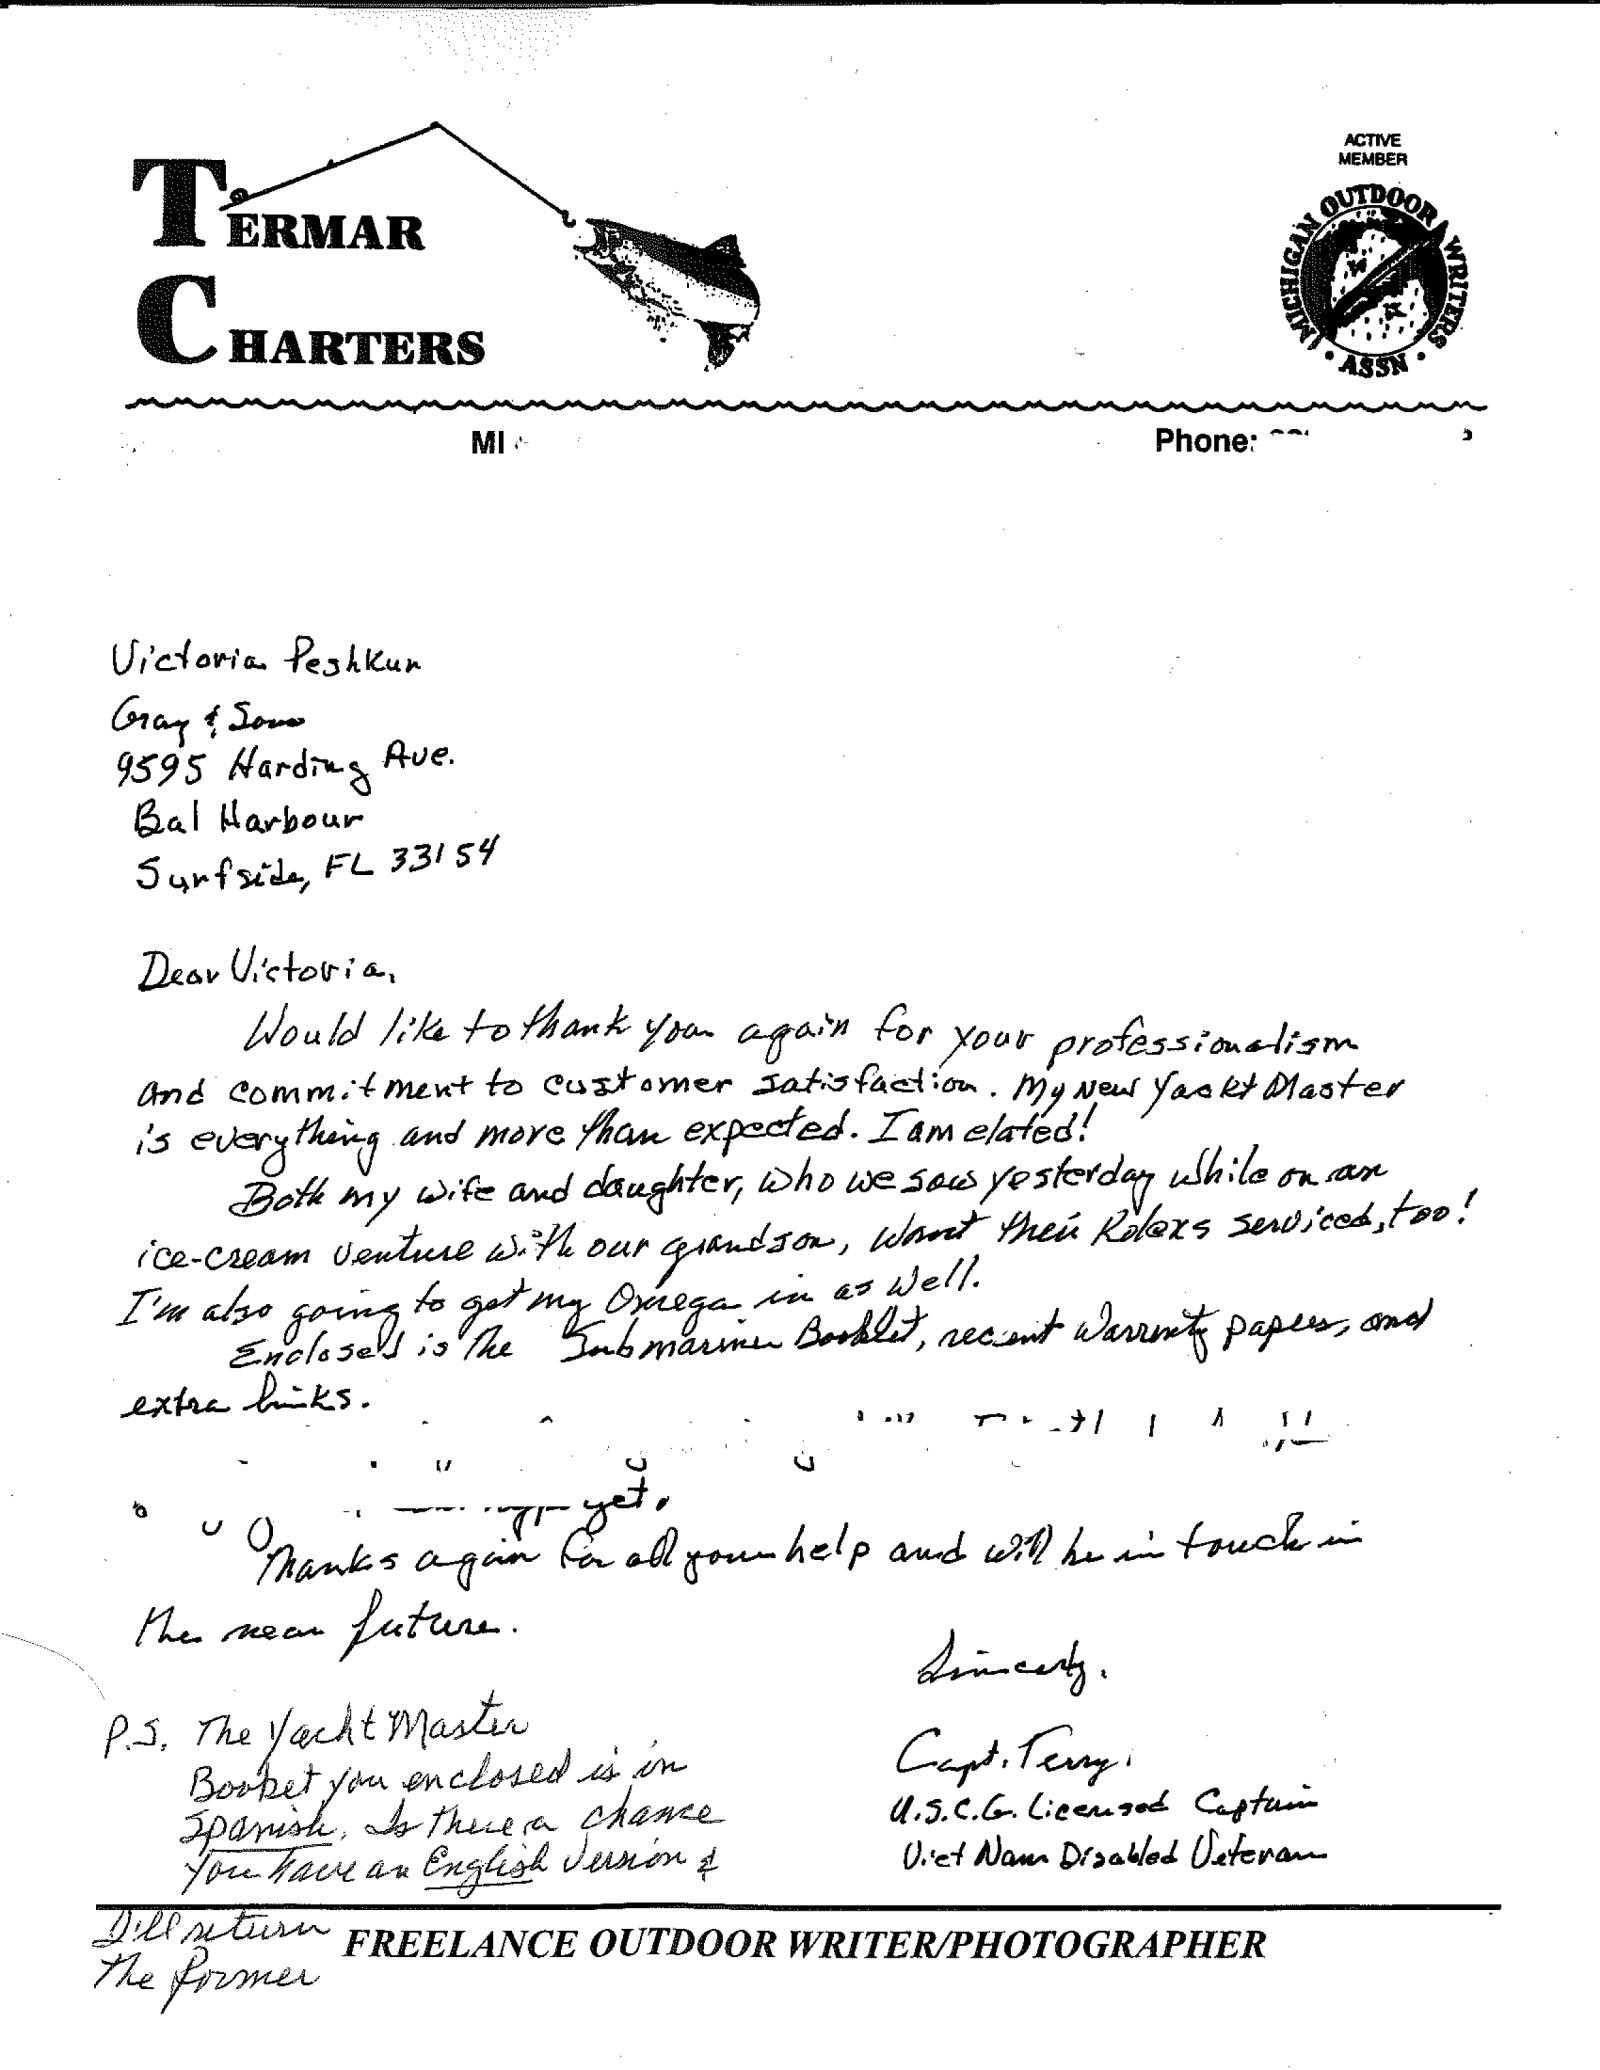 Marlee's email testimonial